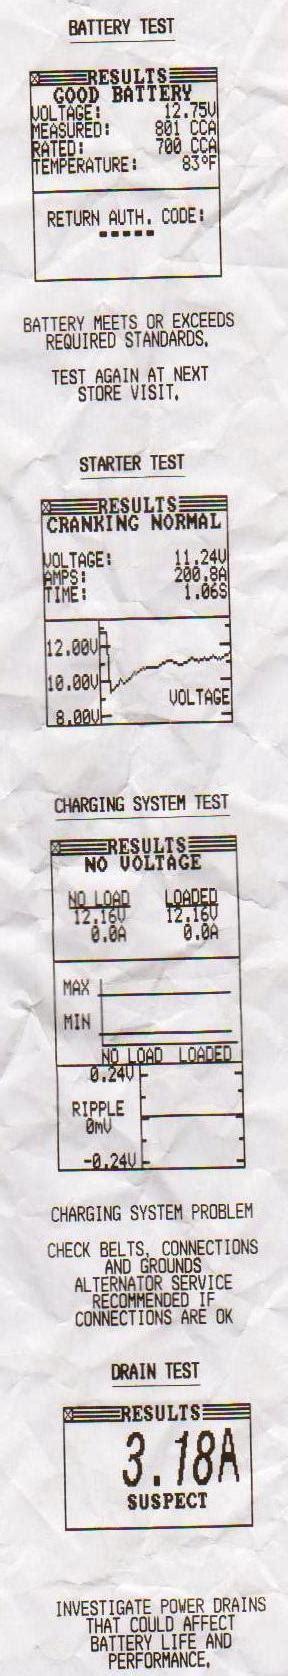 Alternator Charging System Problem Have The